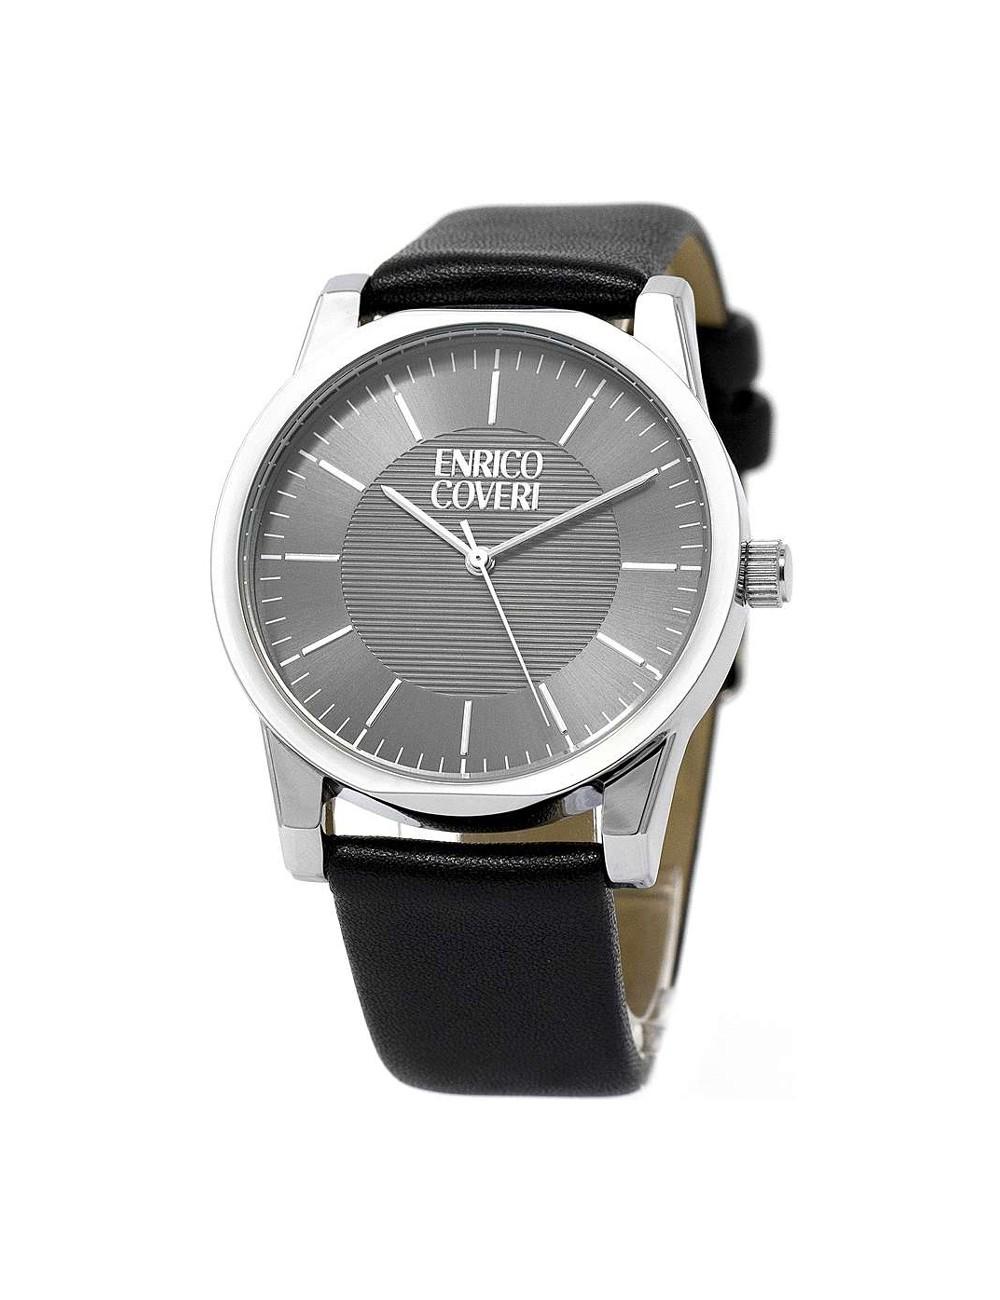 Enrico Coveri ECTC060 Ladies Watch